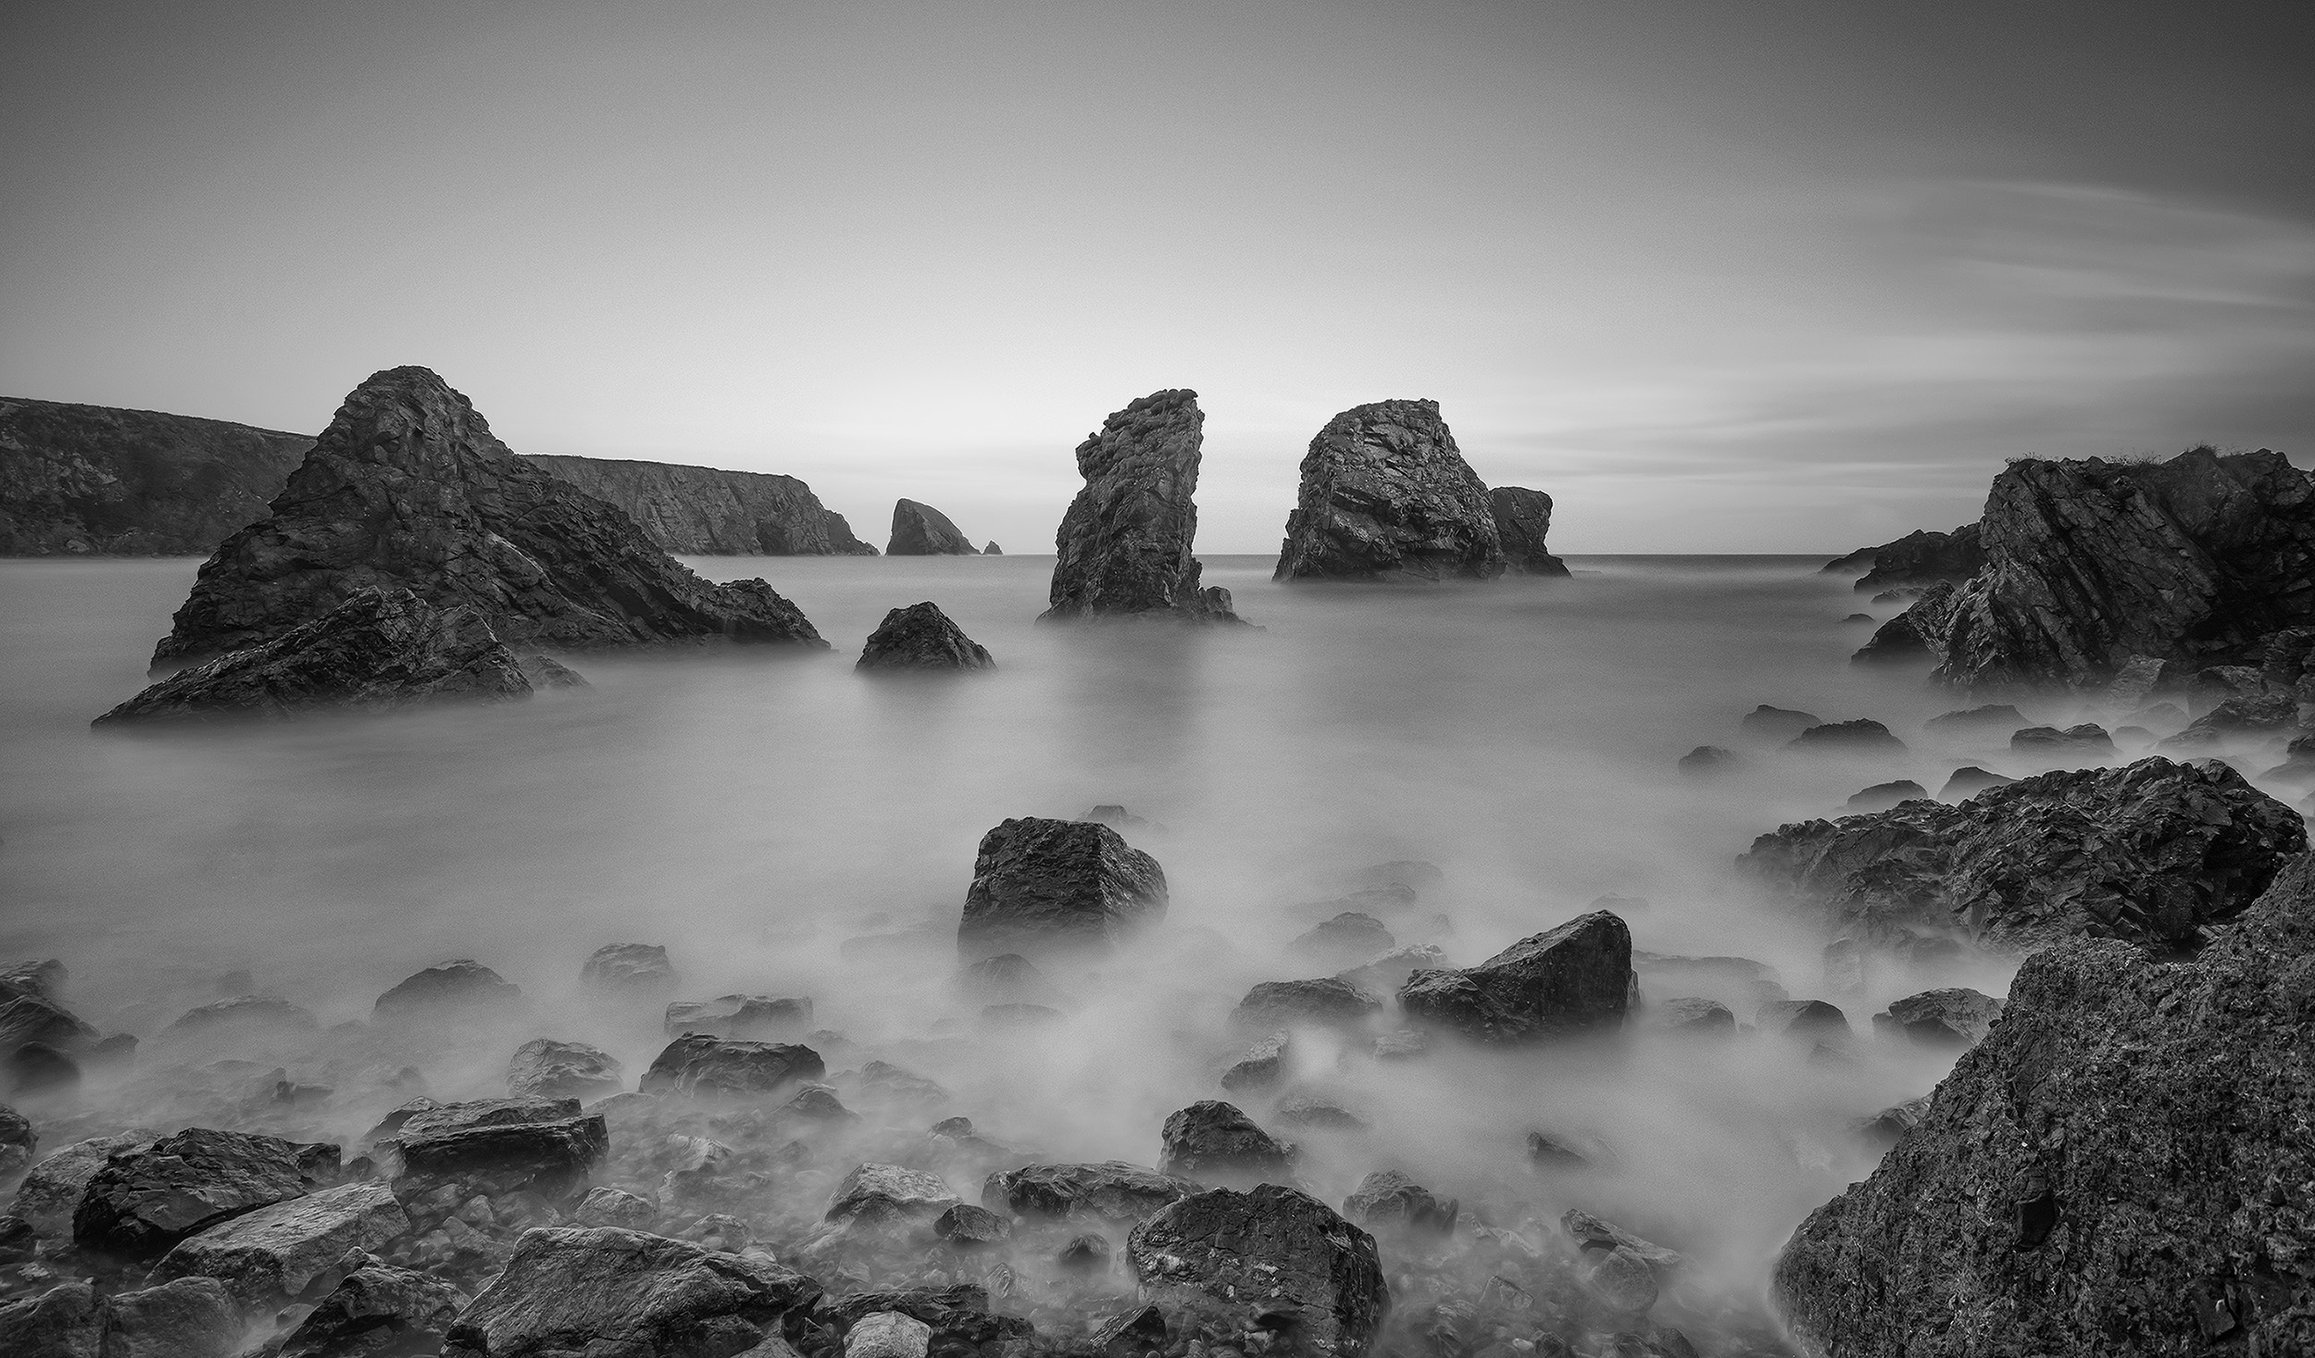 Ballydwan, Copper Coast, CO. Waterford